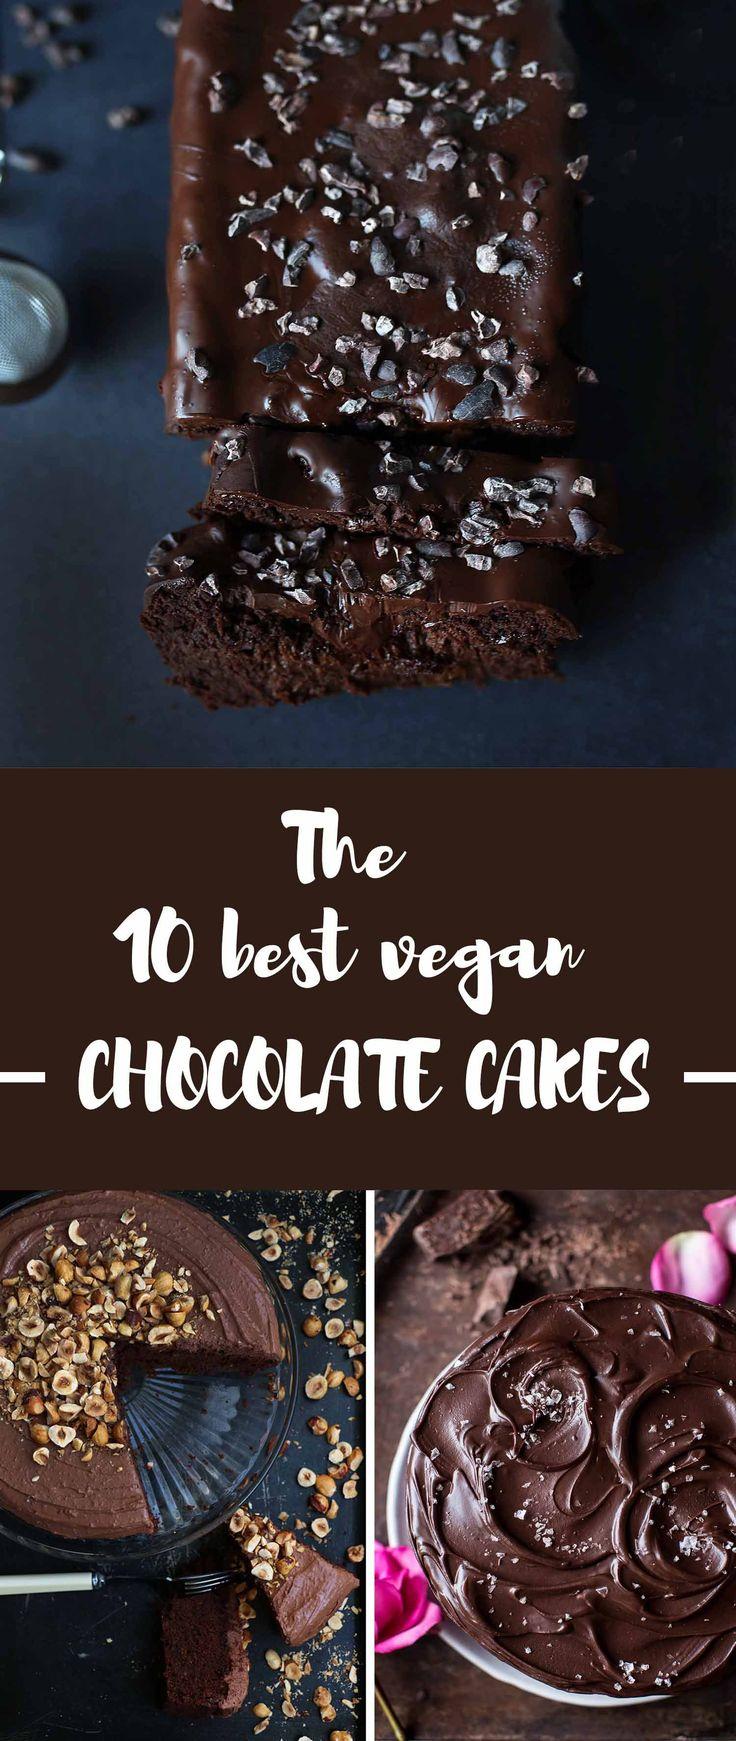 The 10 best vegan chocolate cakes